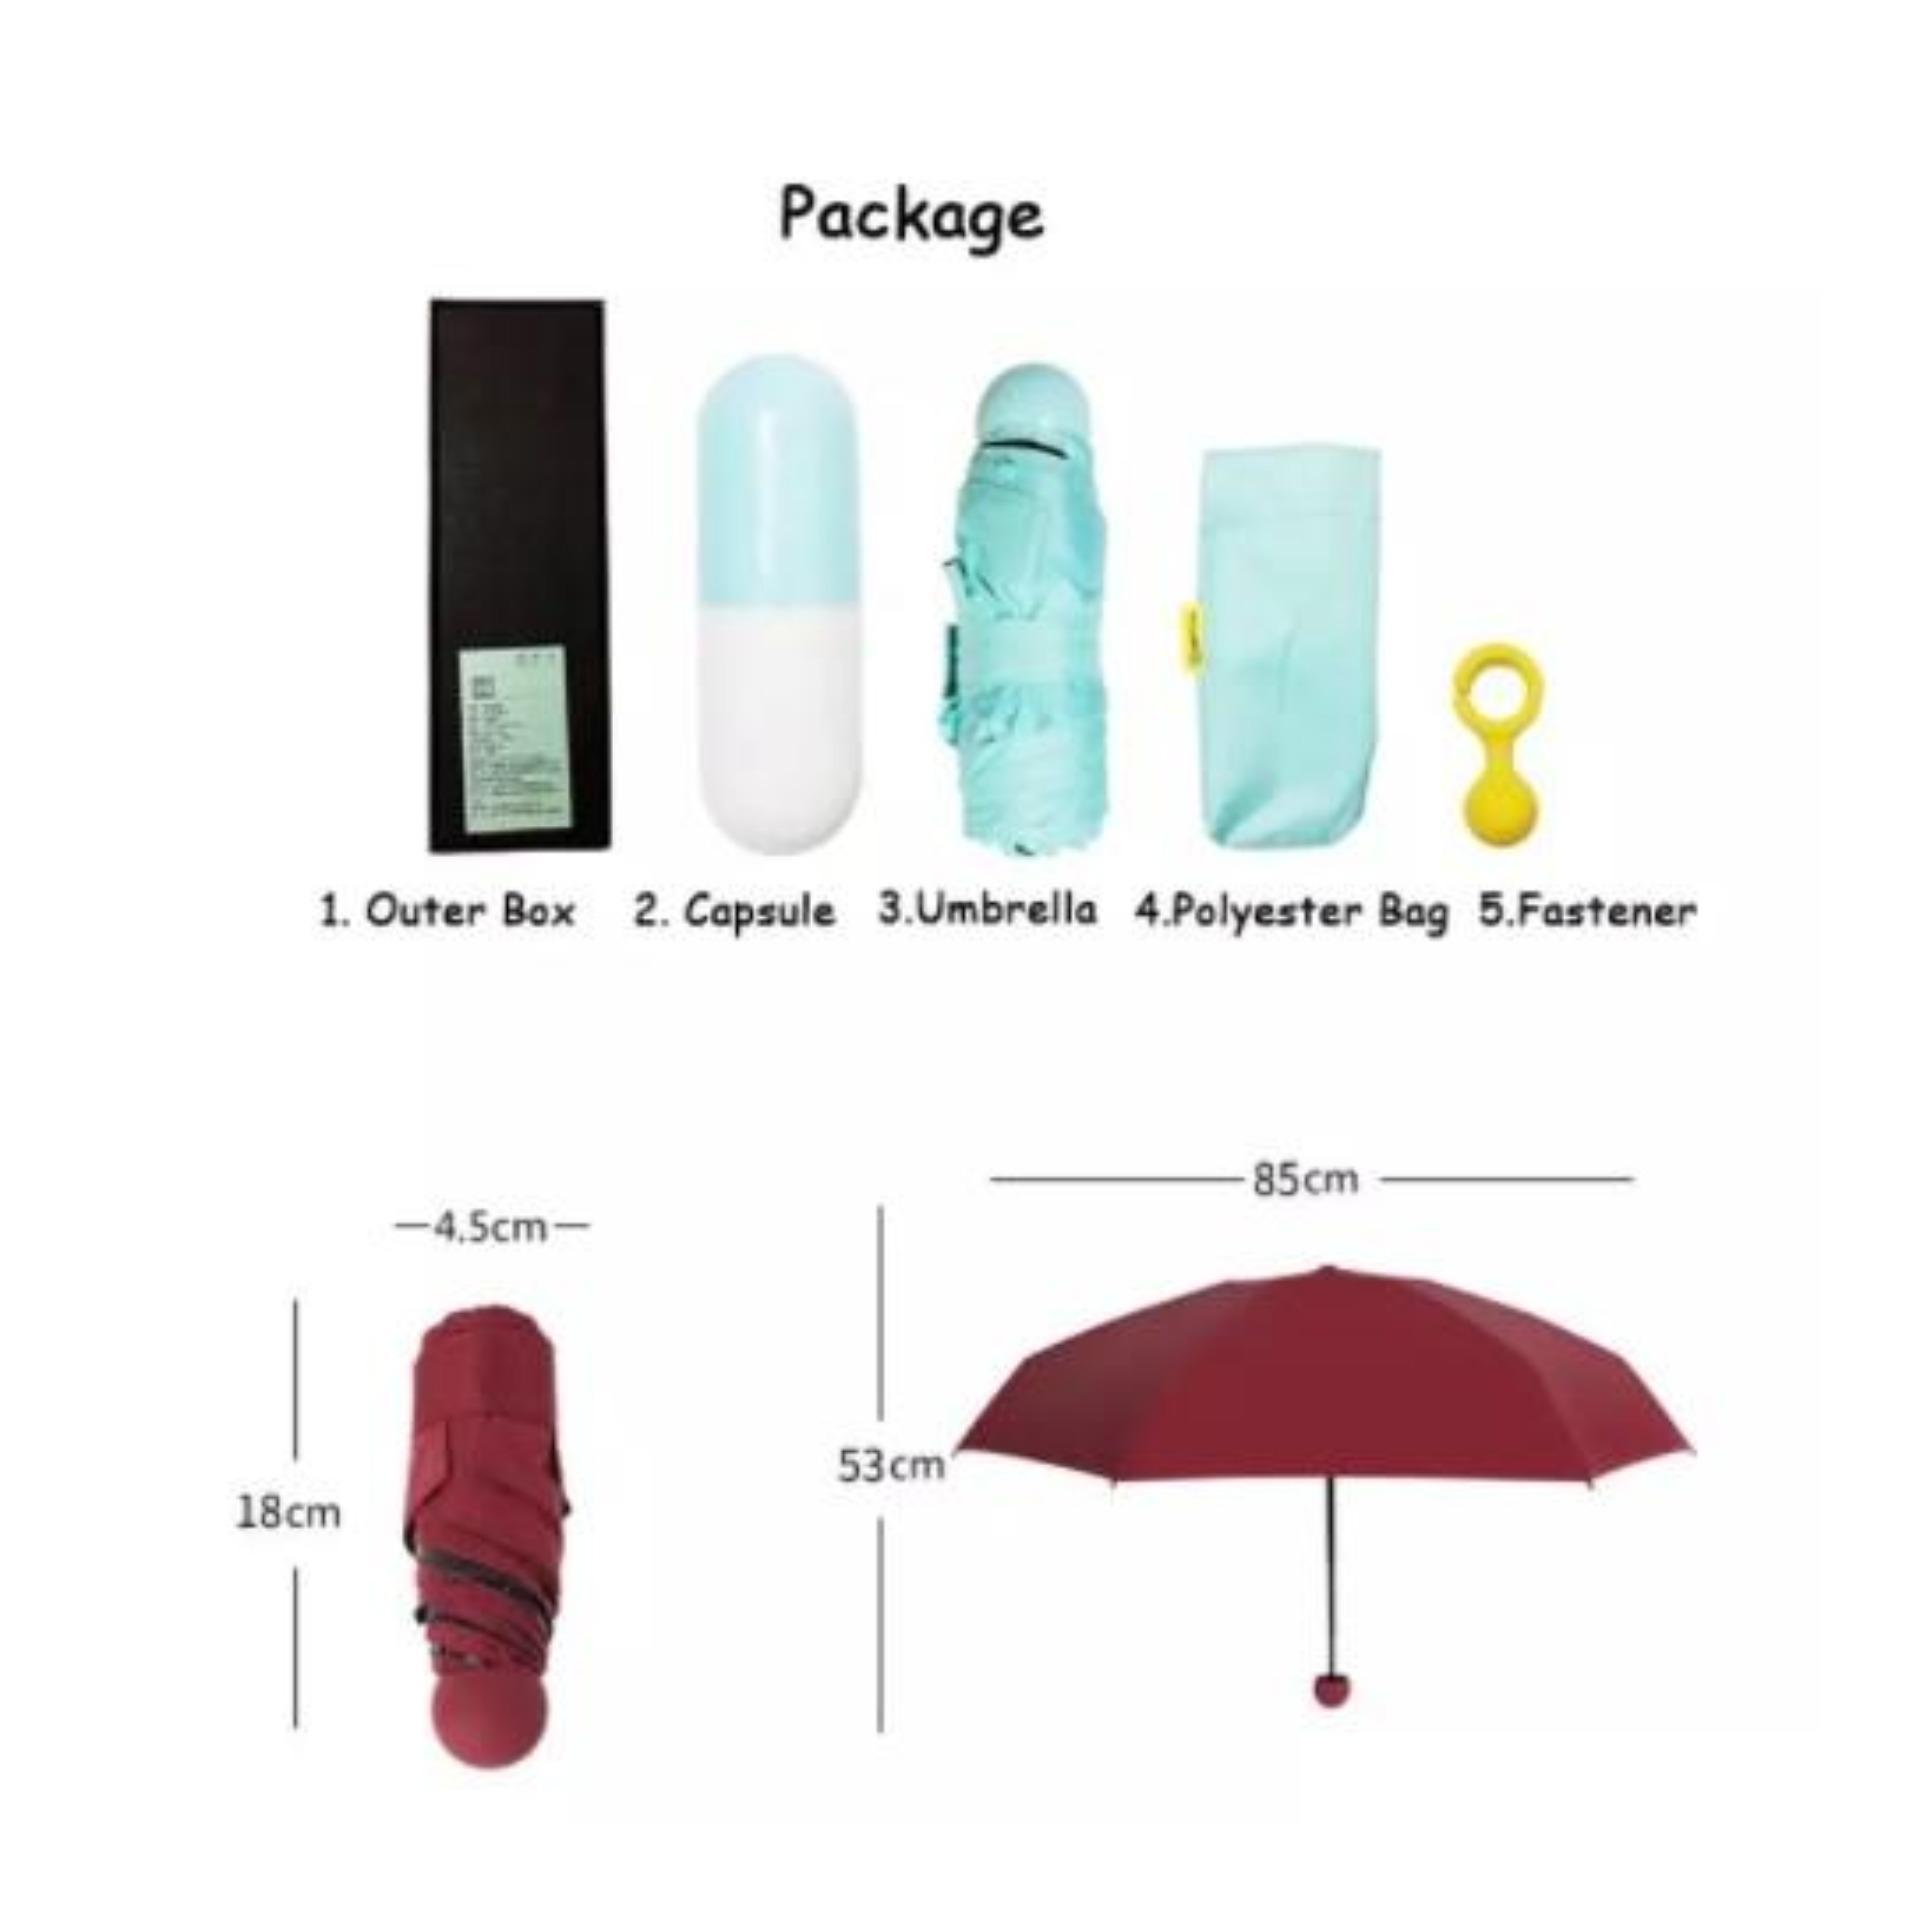 Perbandingan Harga Payung Kapsul Mini Lipat 3 Micro Capsule Terbalik Gagang C Reverse Umbrella Kazbrella Sj0015 Anti Uvbentuk Kecil Iphone Tas